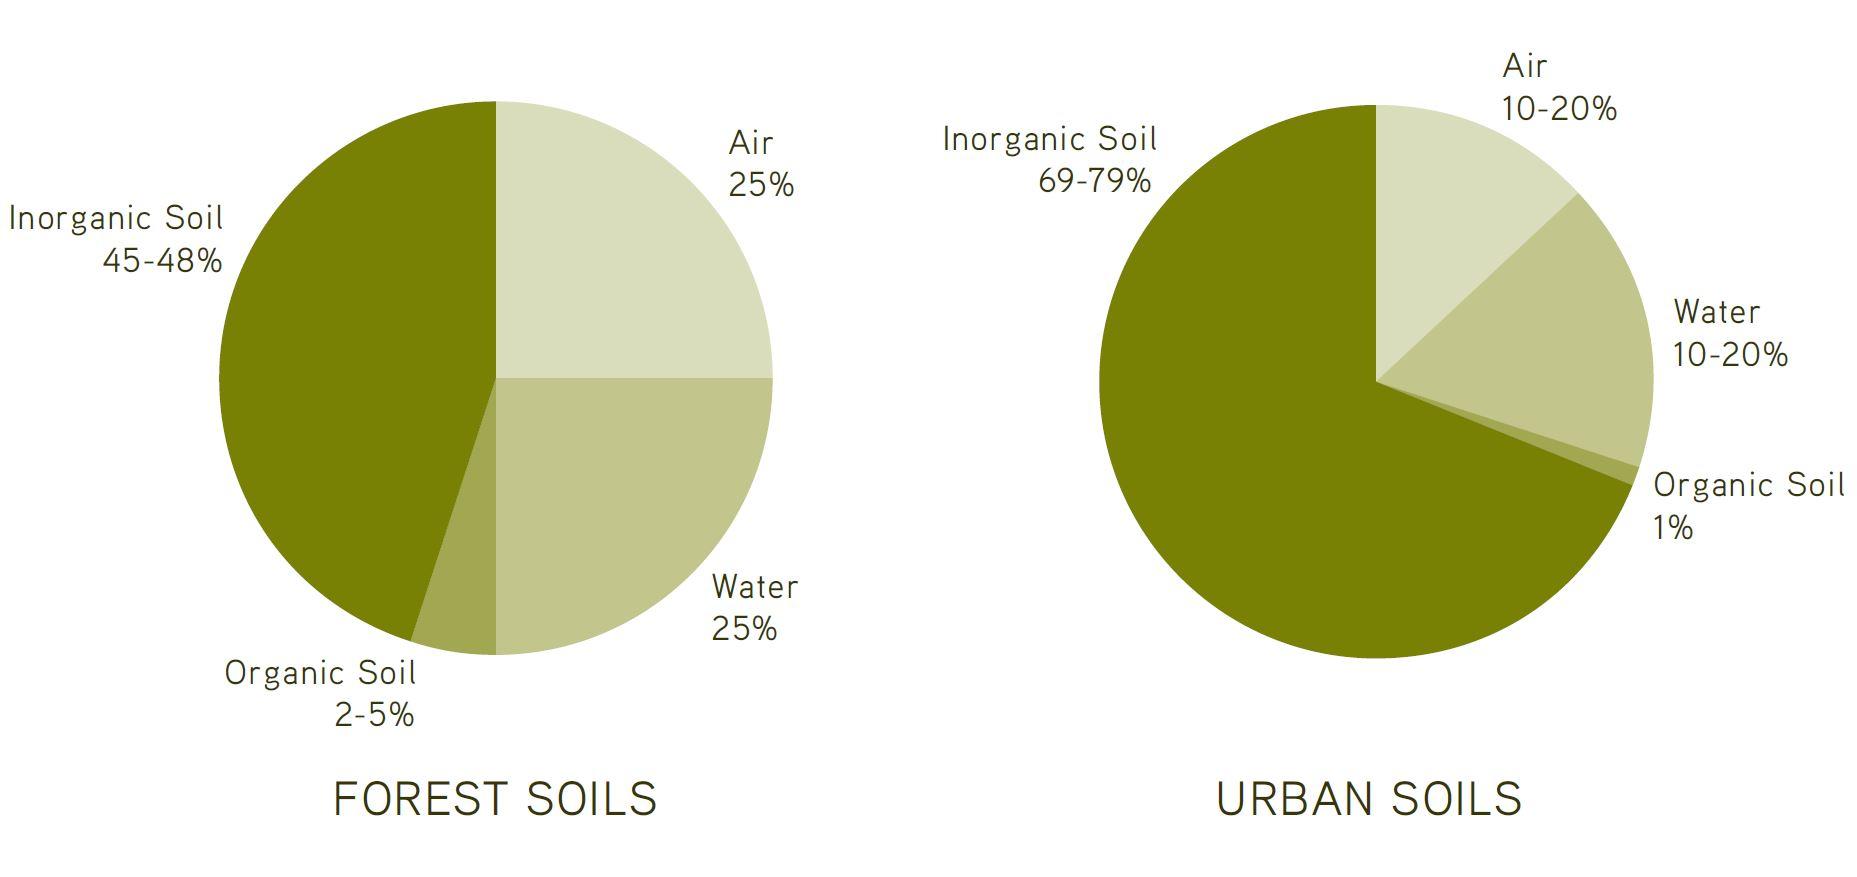 hight resolution of forest soil versus urban soil 2014